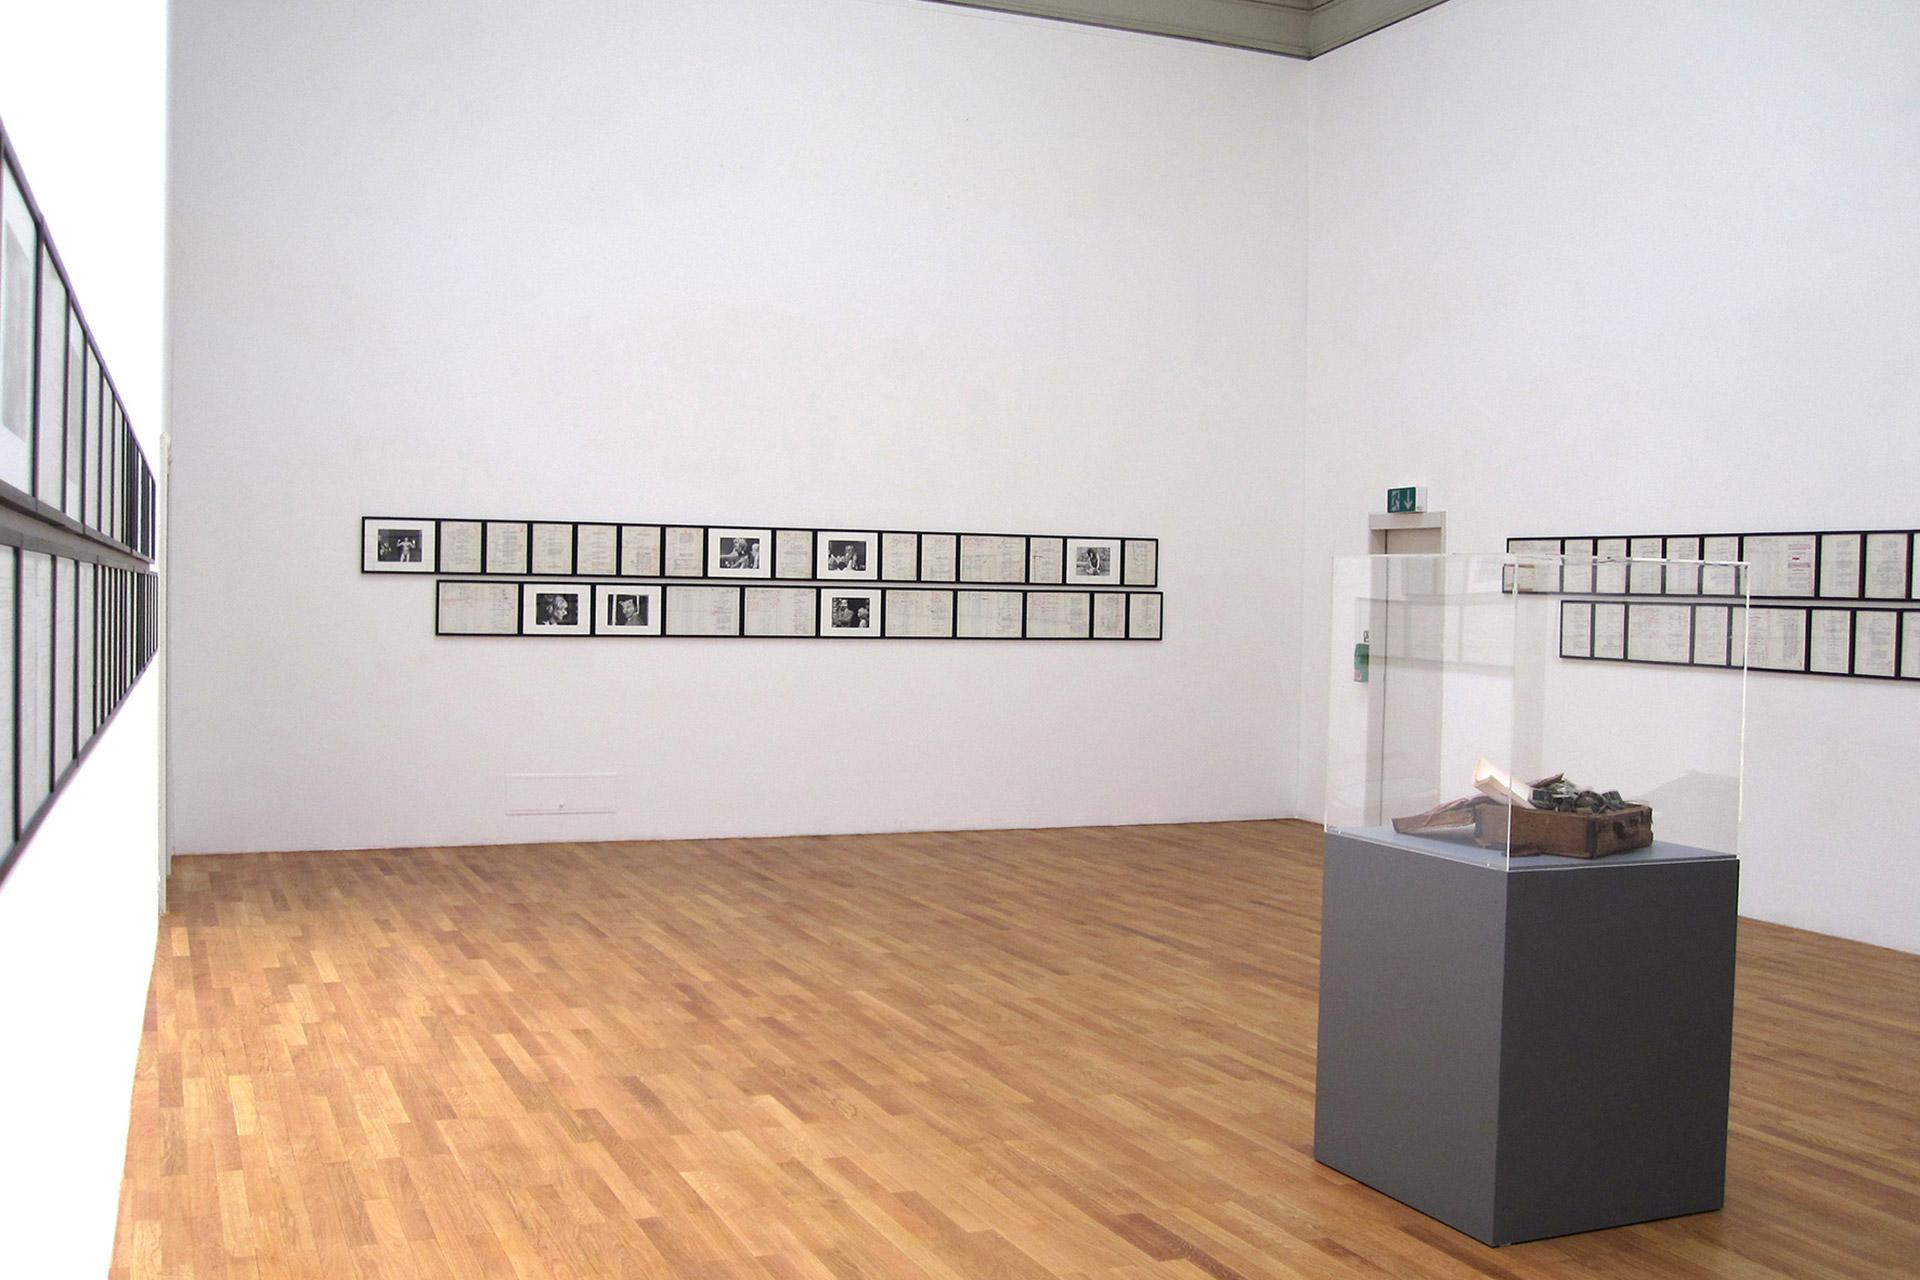 Telephone-Book-Kunsthalle-Winterthur-2010-2.jpg